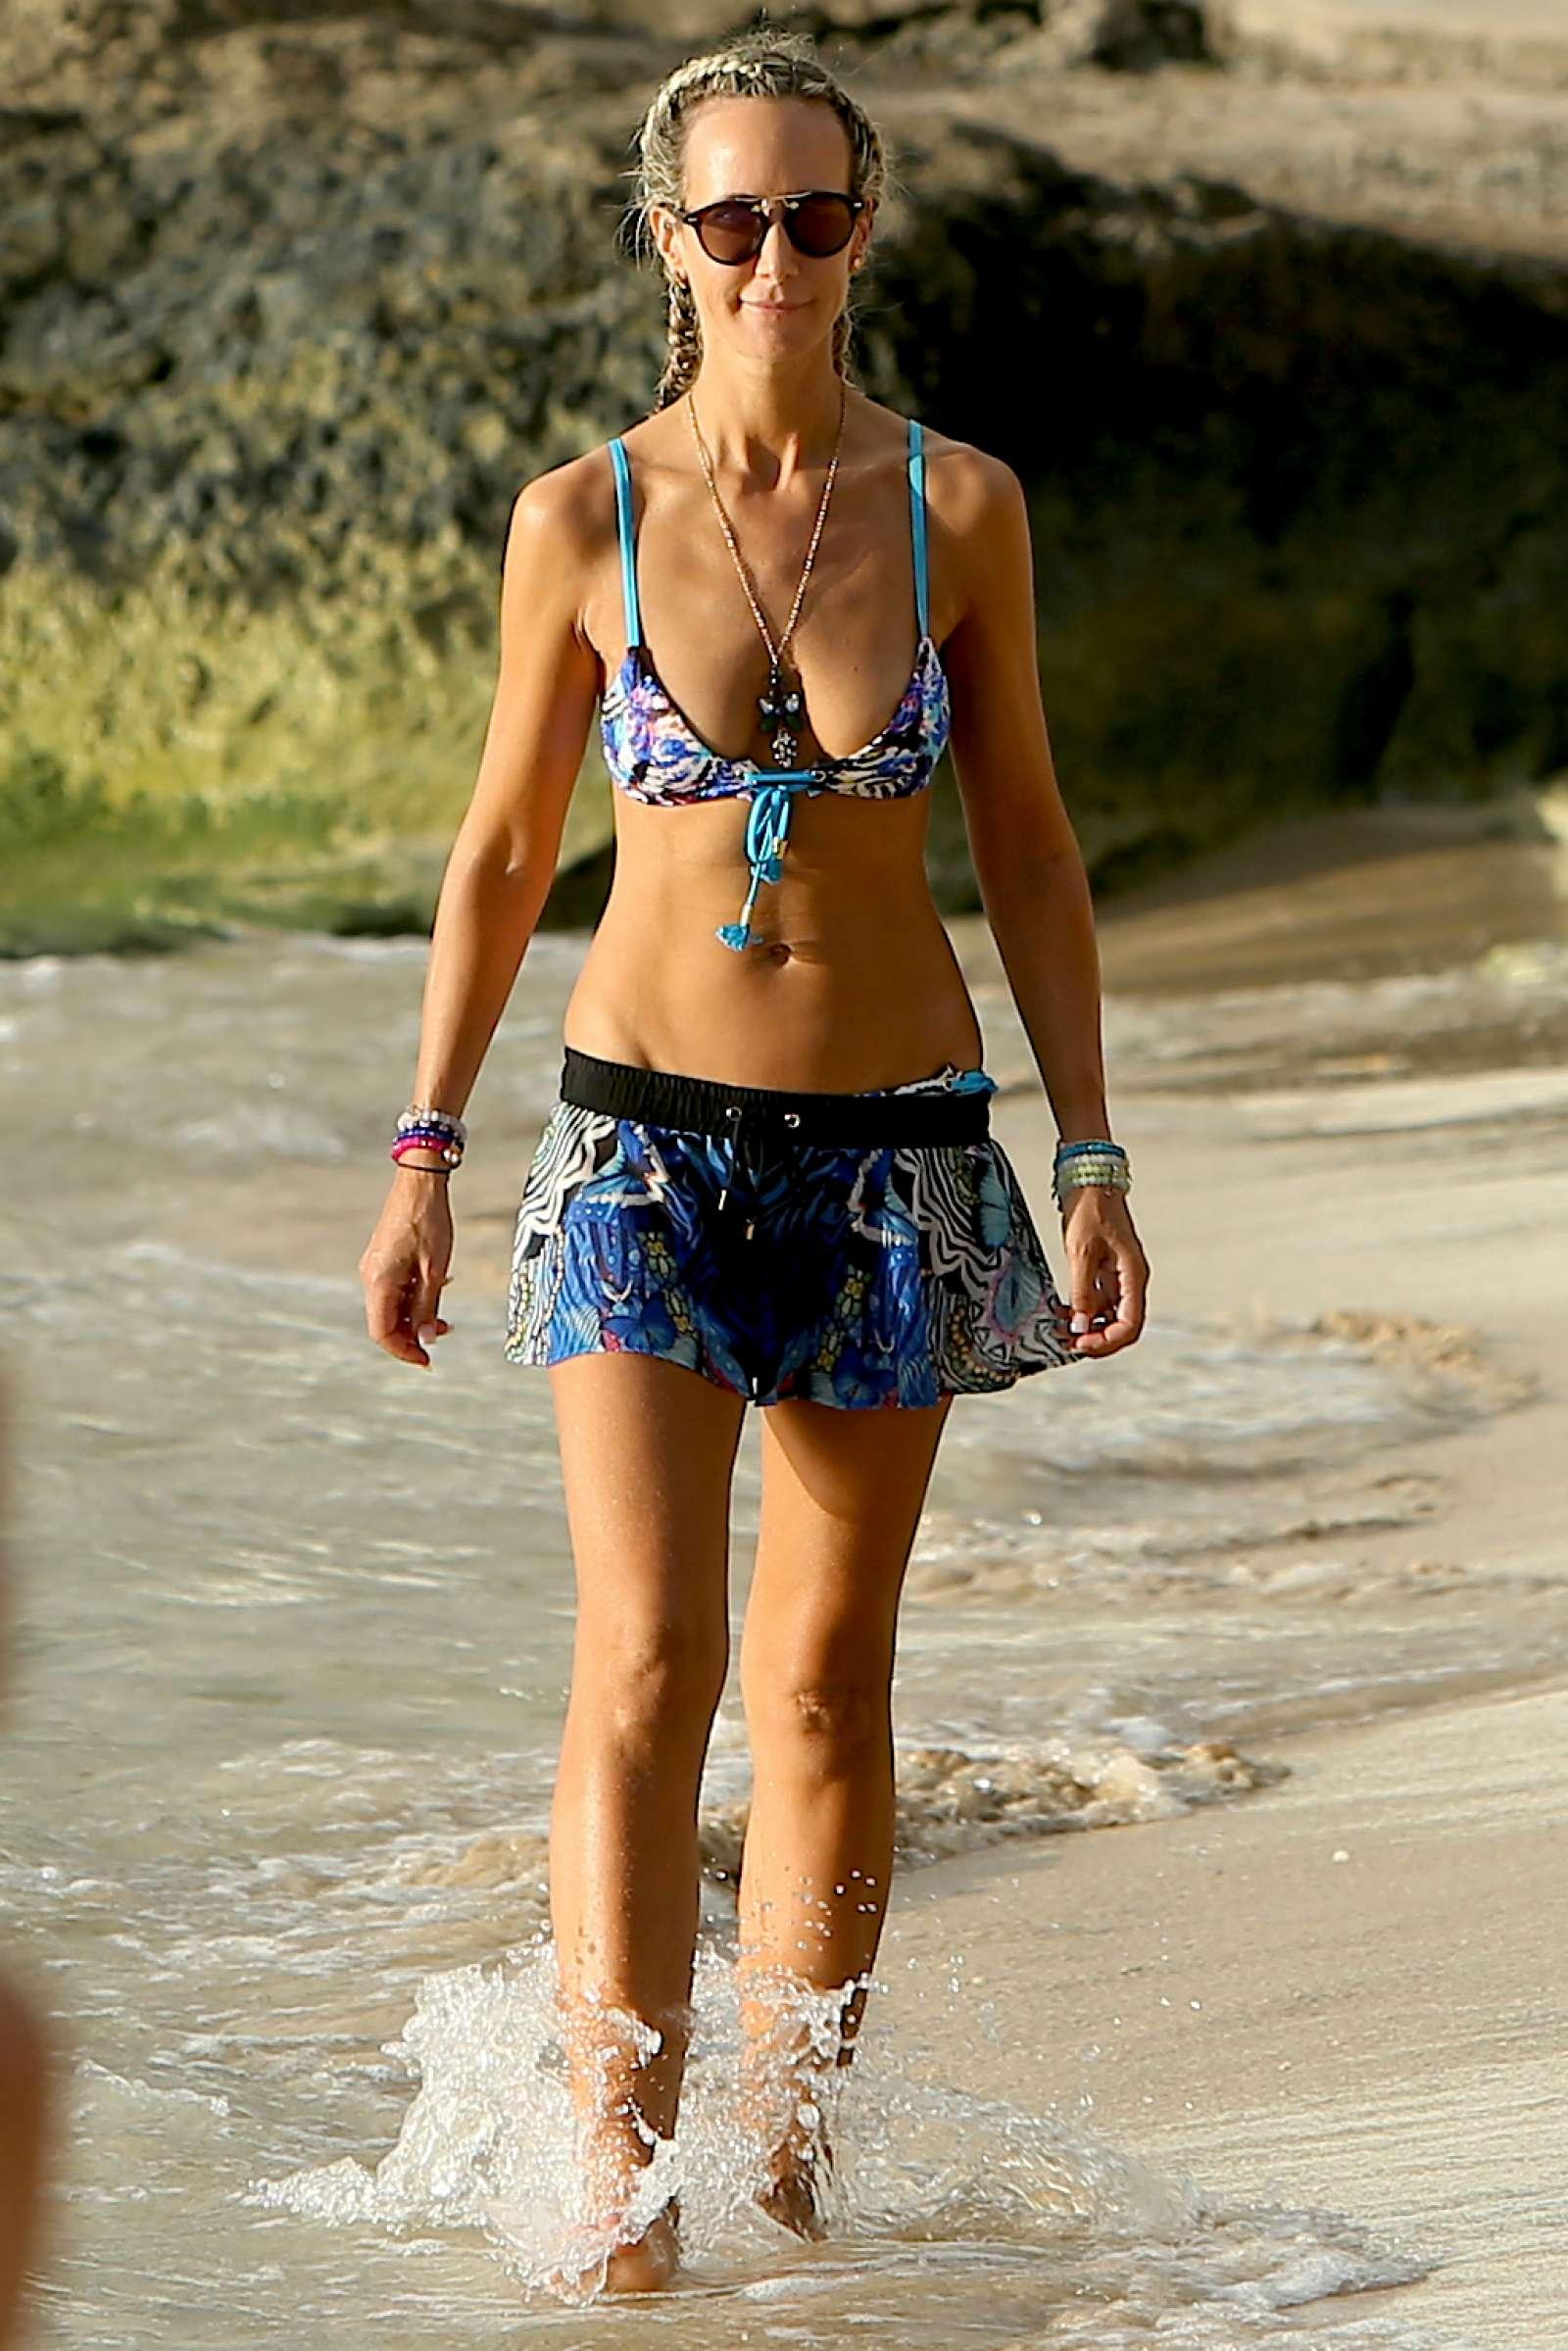 Lady Victoria Hervey 2017 : Lady Victoria Hervey in Bikini 2017 -43